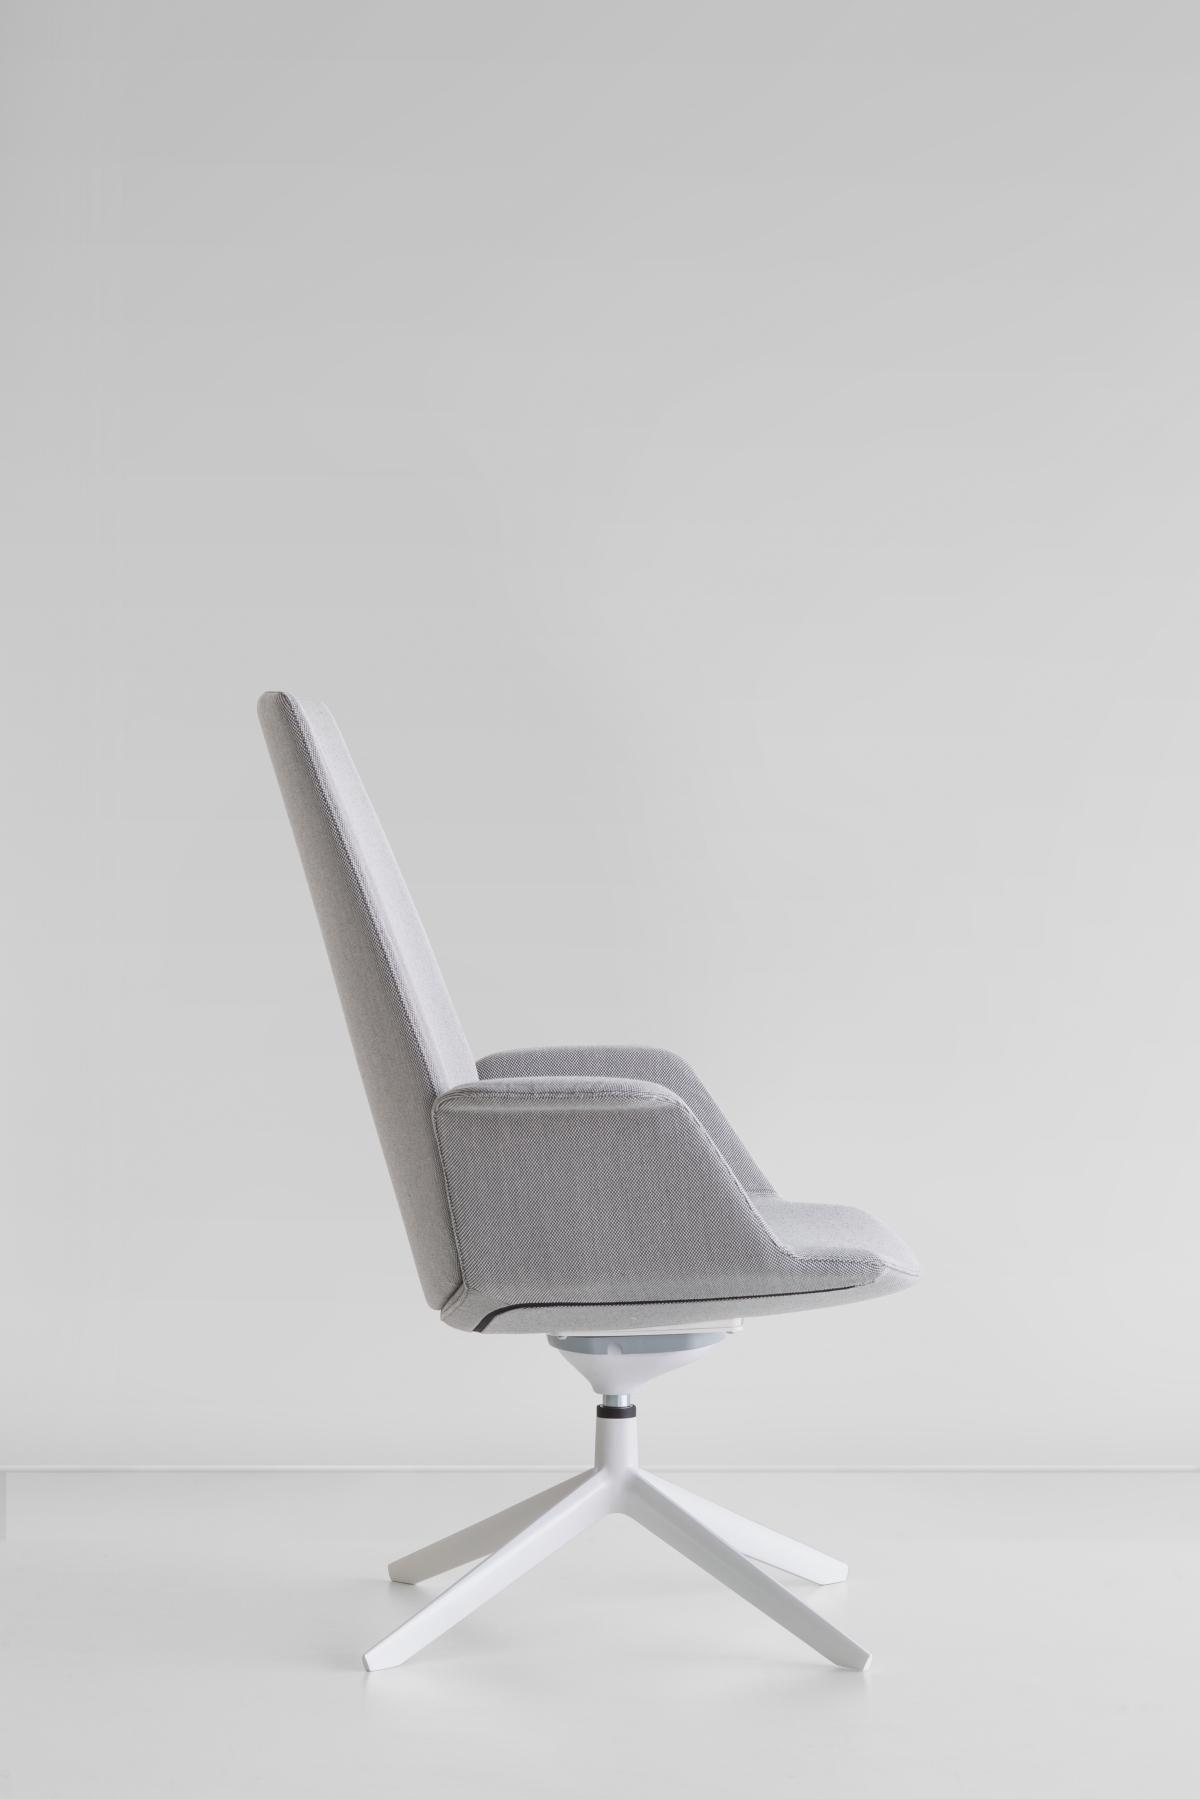 A modular seating, Francesco Rota for Lapalma, side view